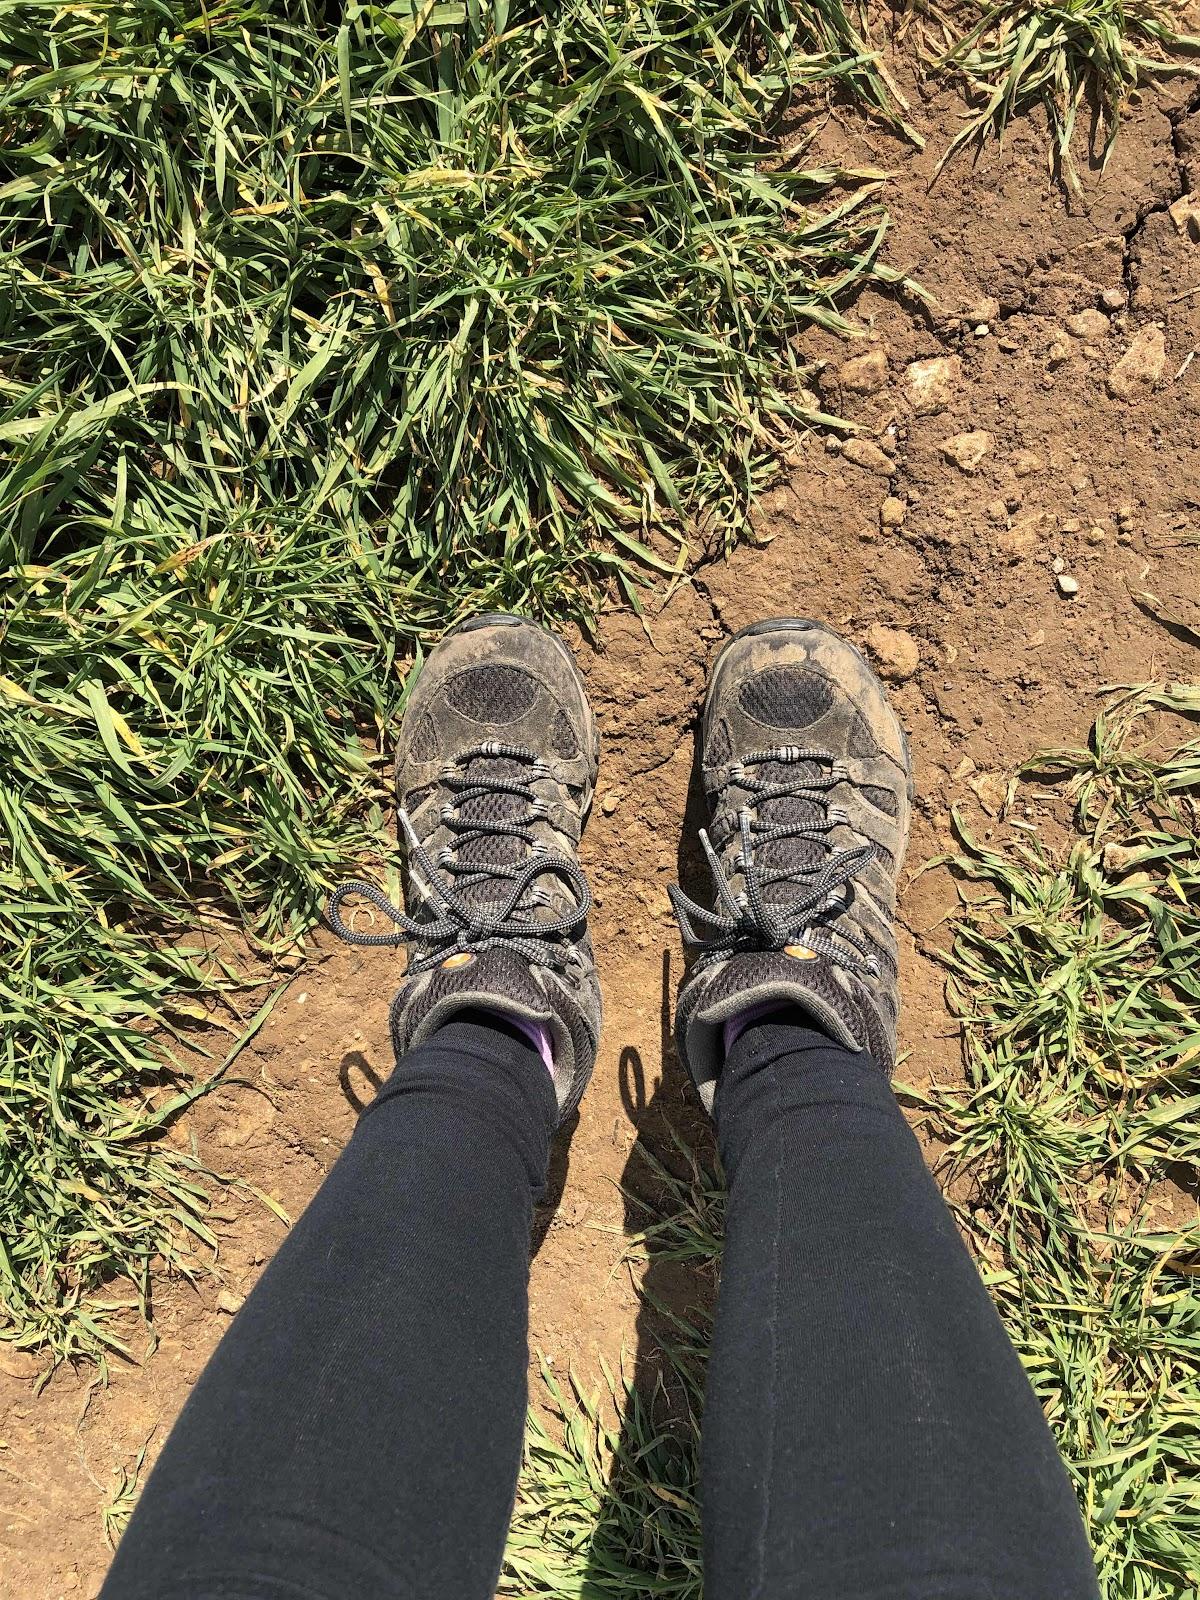 Muddy walking boots on a narrow path along a field